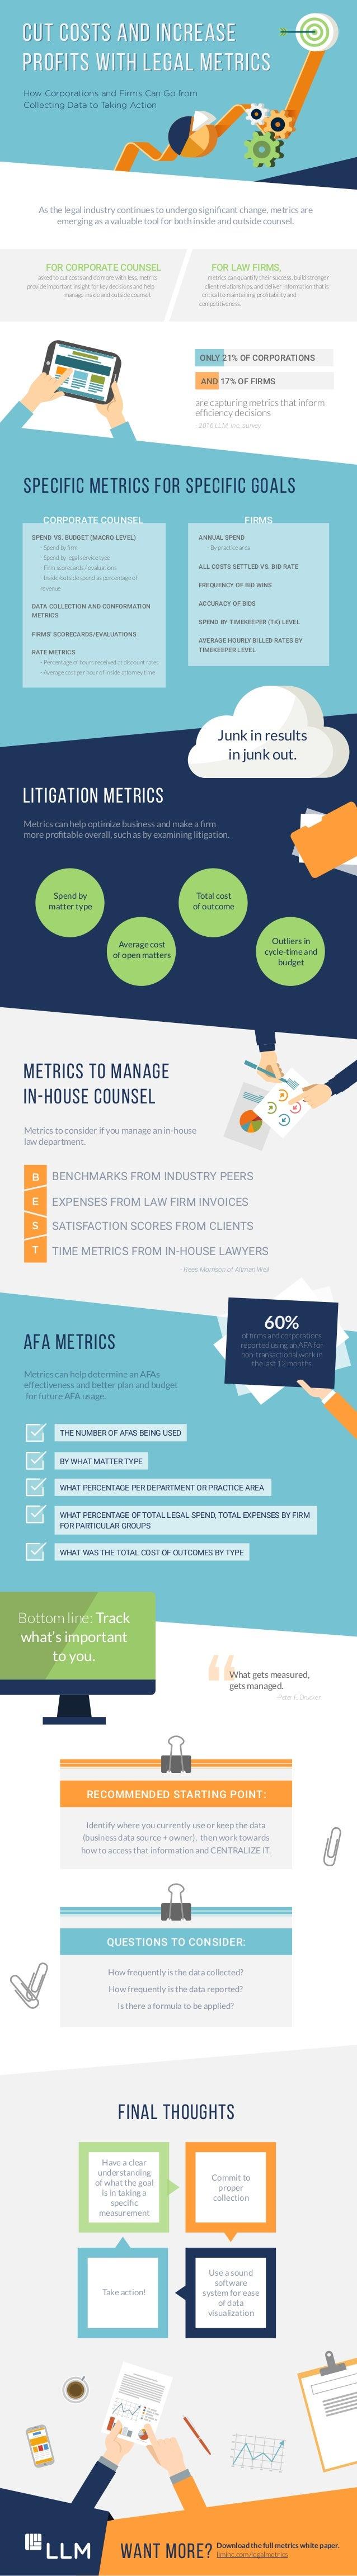 AFA METRICS CUT COSTS AND INCREASE PROFITS WITH LEGAL METRICS CUT COSTS AND INCREASE PROFITS WITH LEGAL METRICS How Corpor...